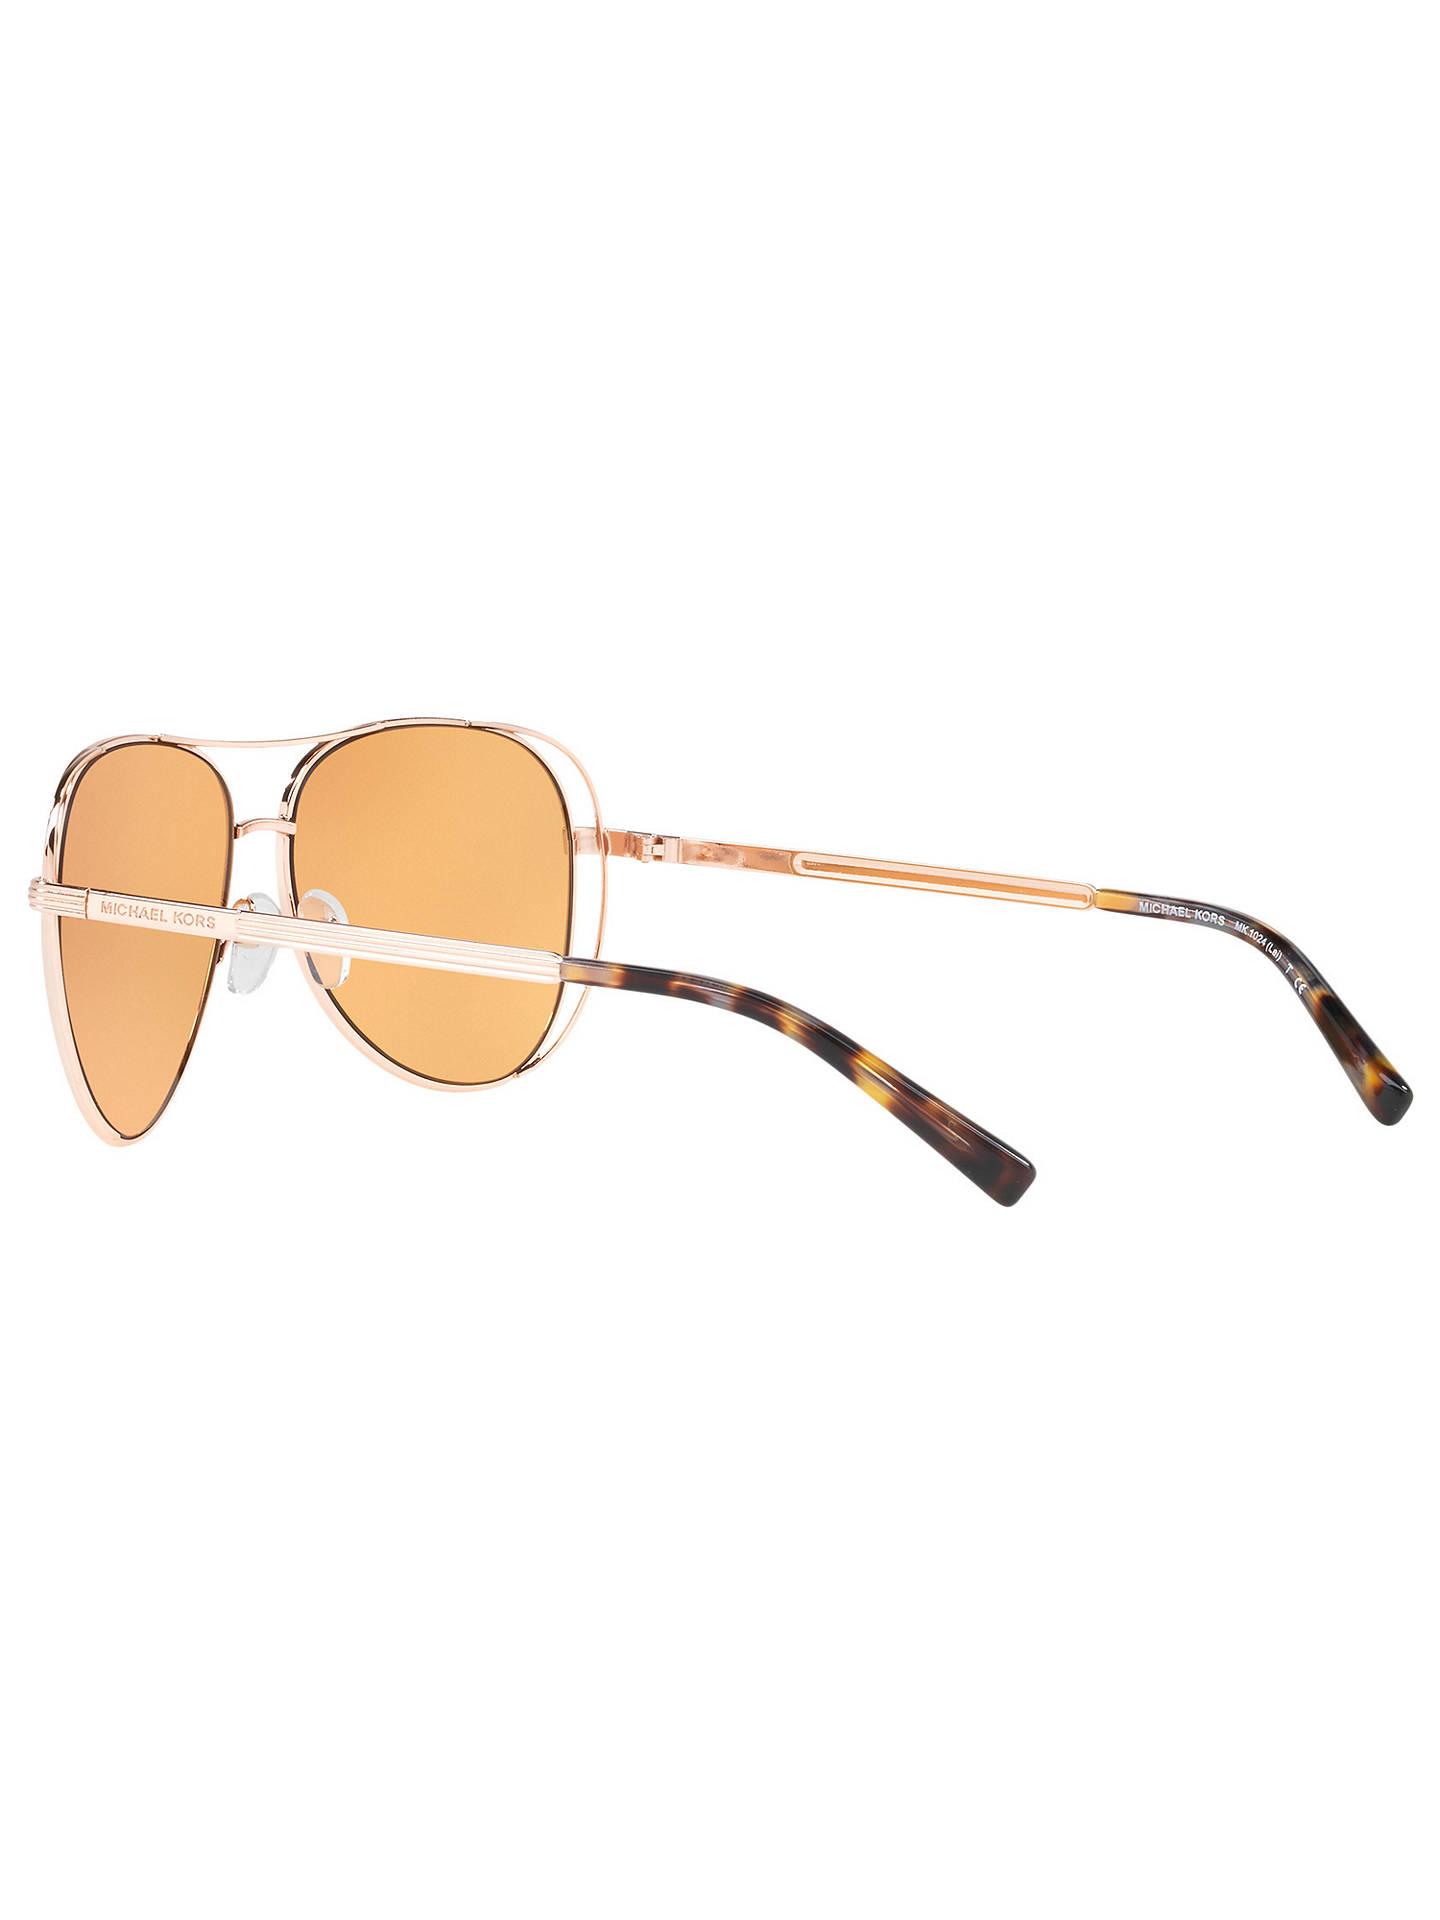 6f226095a6f3 ... Buy Michael Kors MK1024 Lai Aviator Sunglasses